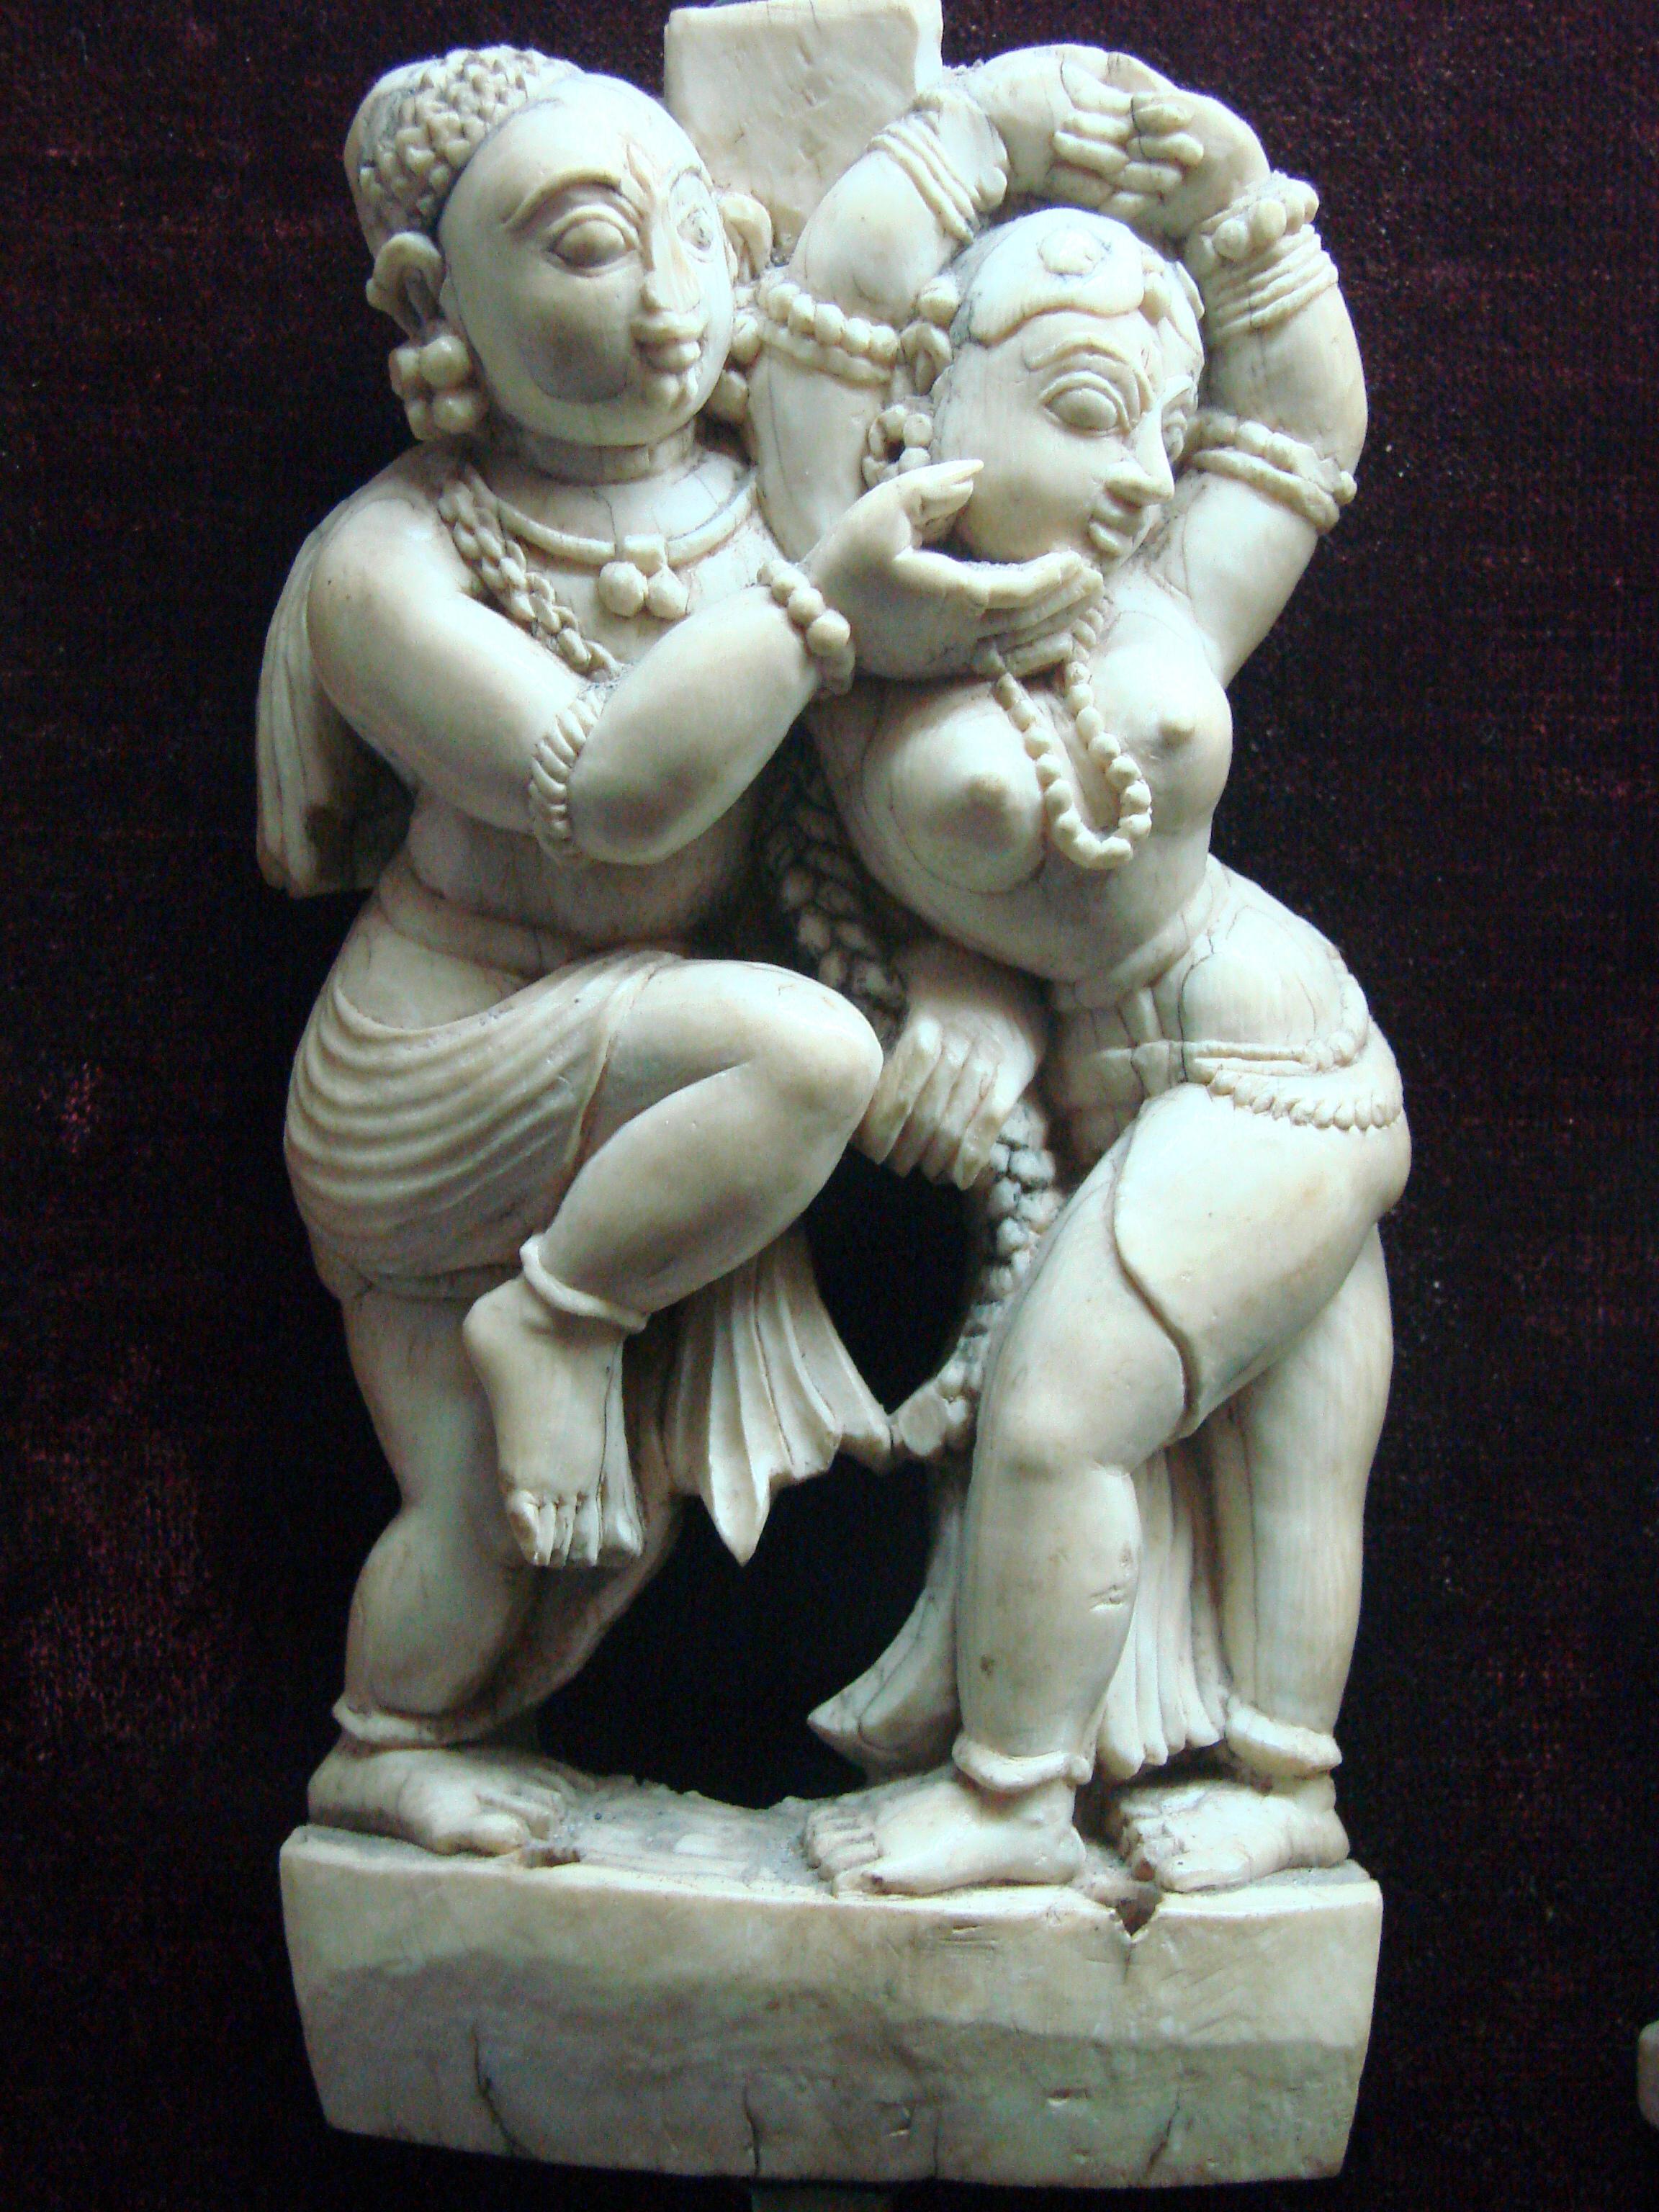 Indijsko vajarstvo Ivory_Sculpture_-_Sri_Meenakshi-Sundareshwarar_Temple_-_Madurai_-_India_01